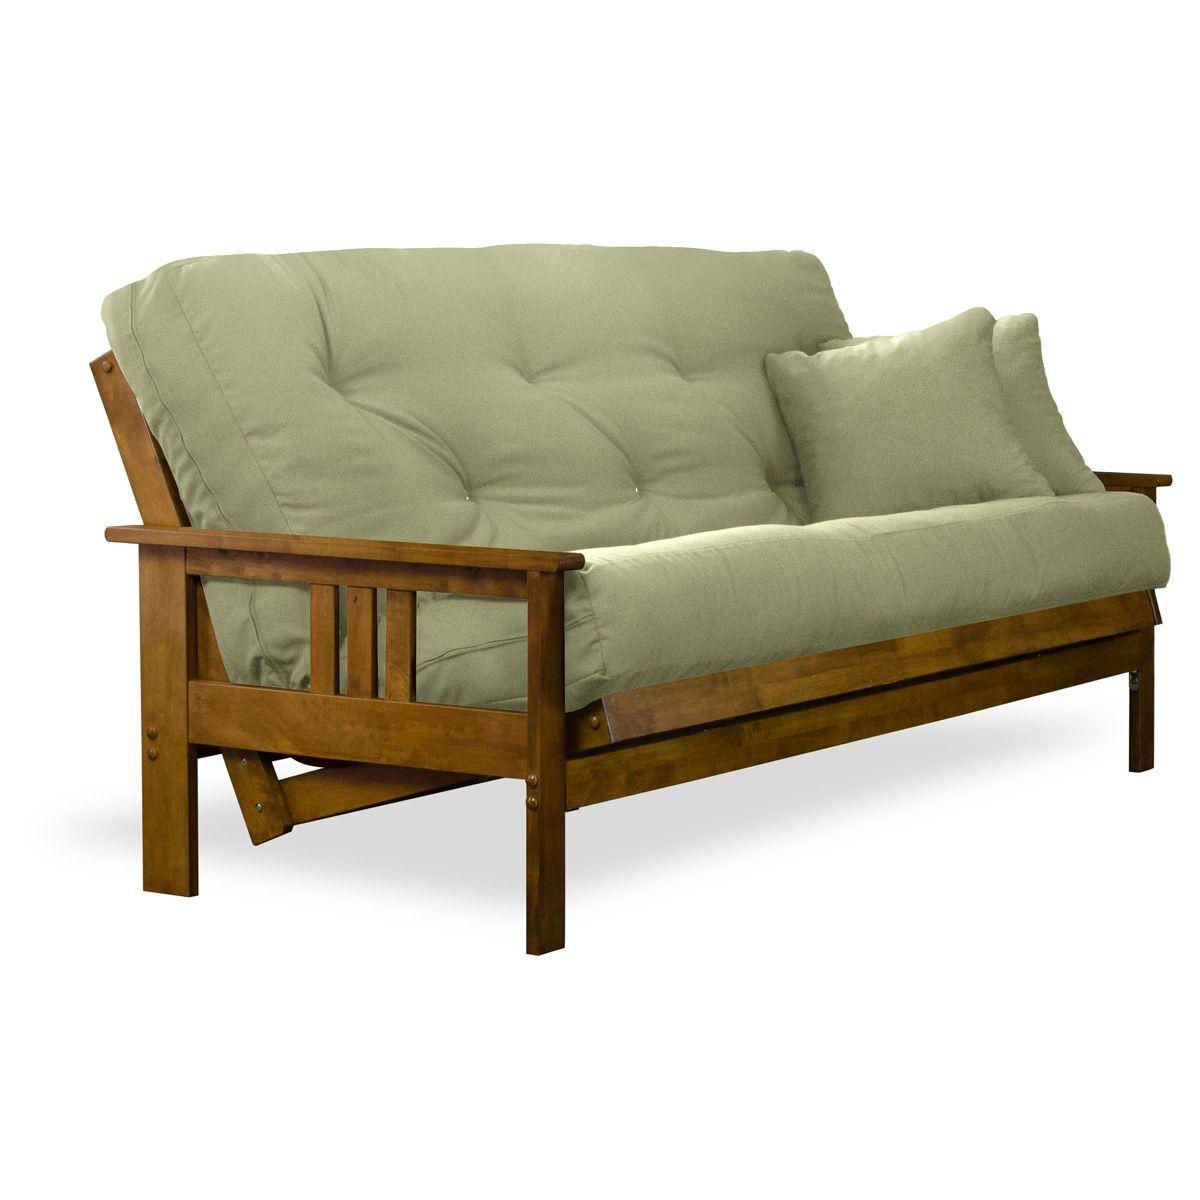 3 Stunning Cool Tips Futon Ideas Porches Round Chair Diy Floor Pillows